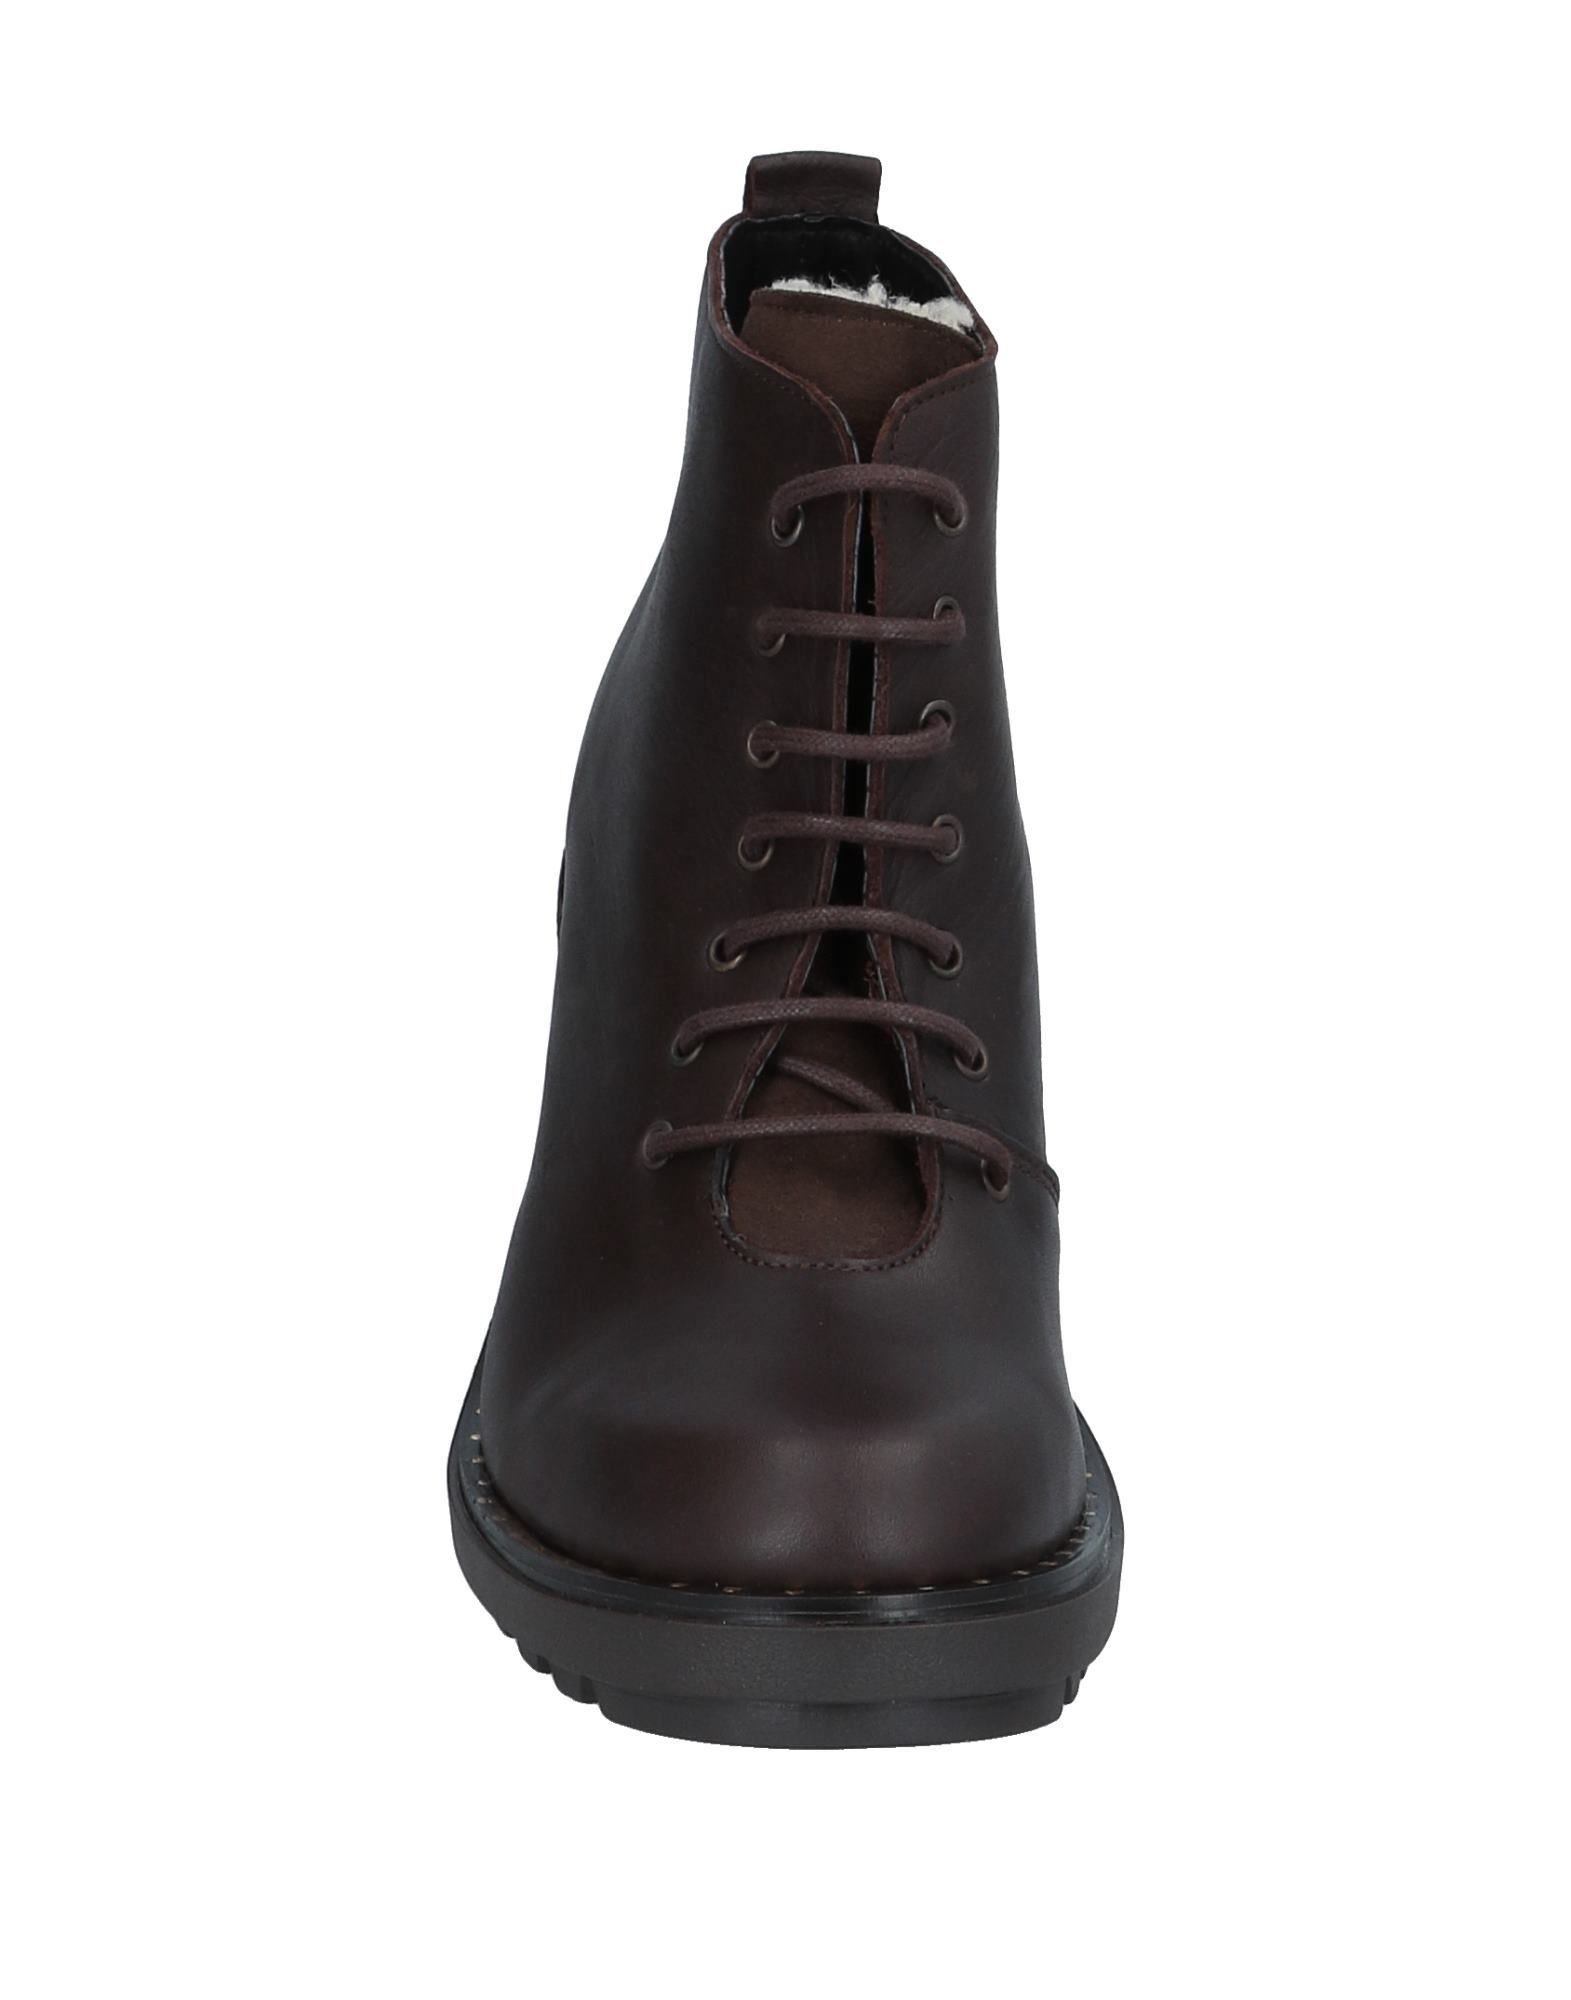 Gut um billige Schuhe Schuhe Schuhe zu tragenLe Pepite Stiefelette Damen  11528585IL 18b064